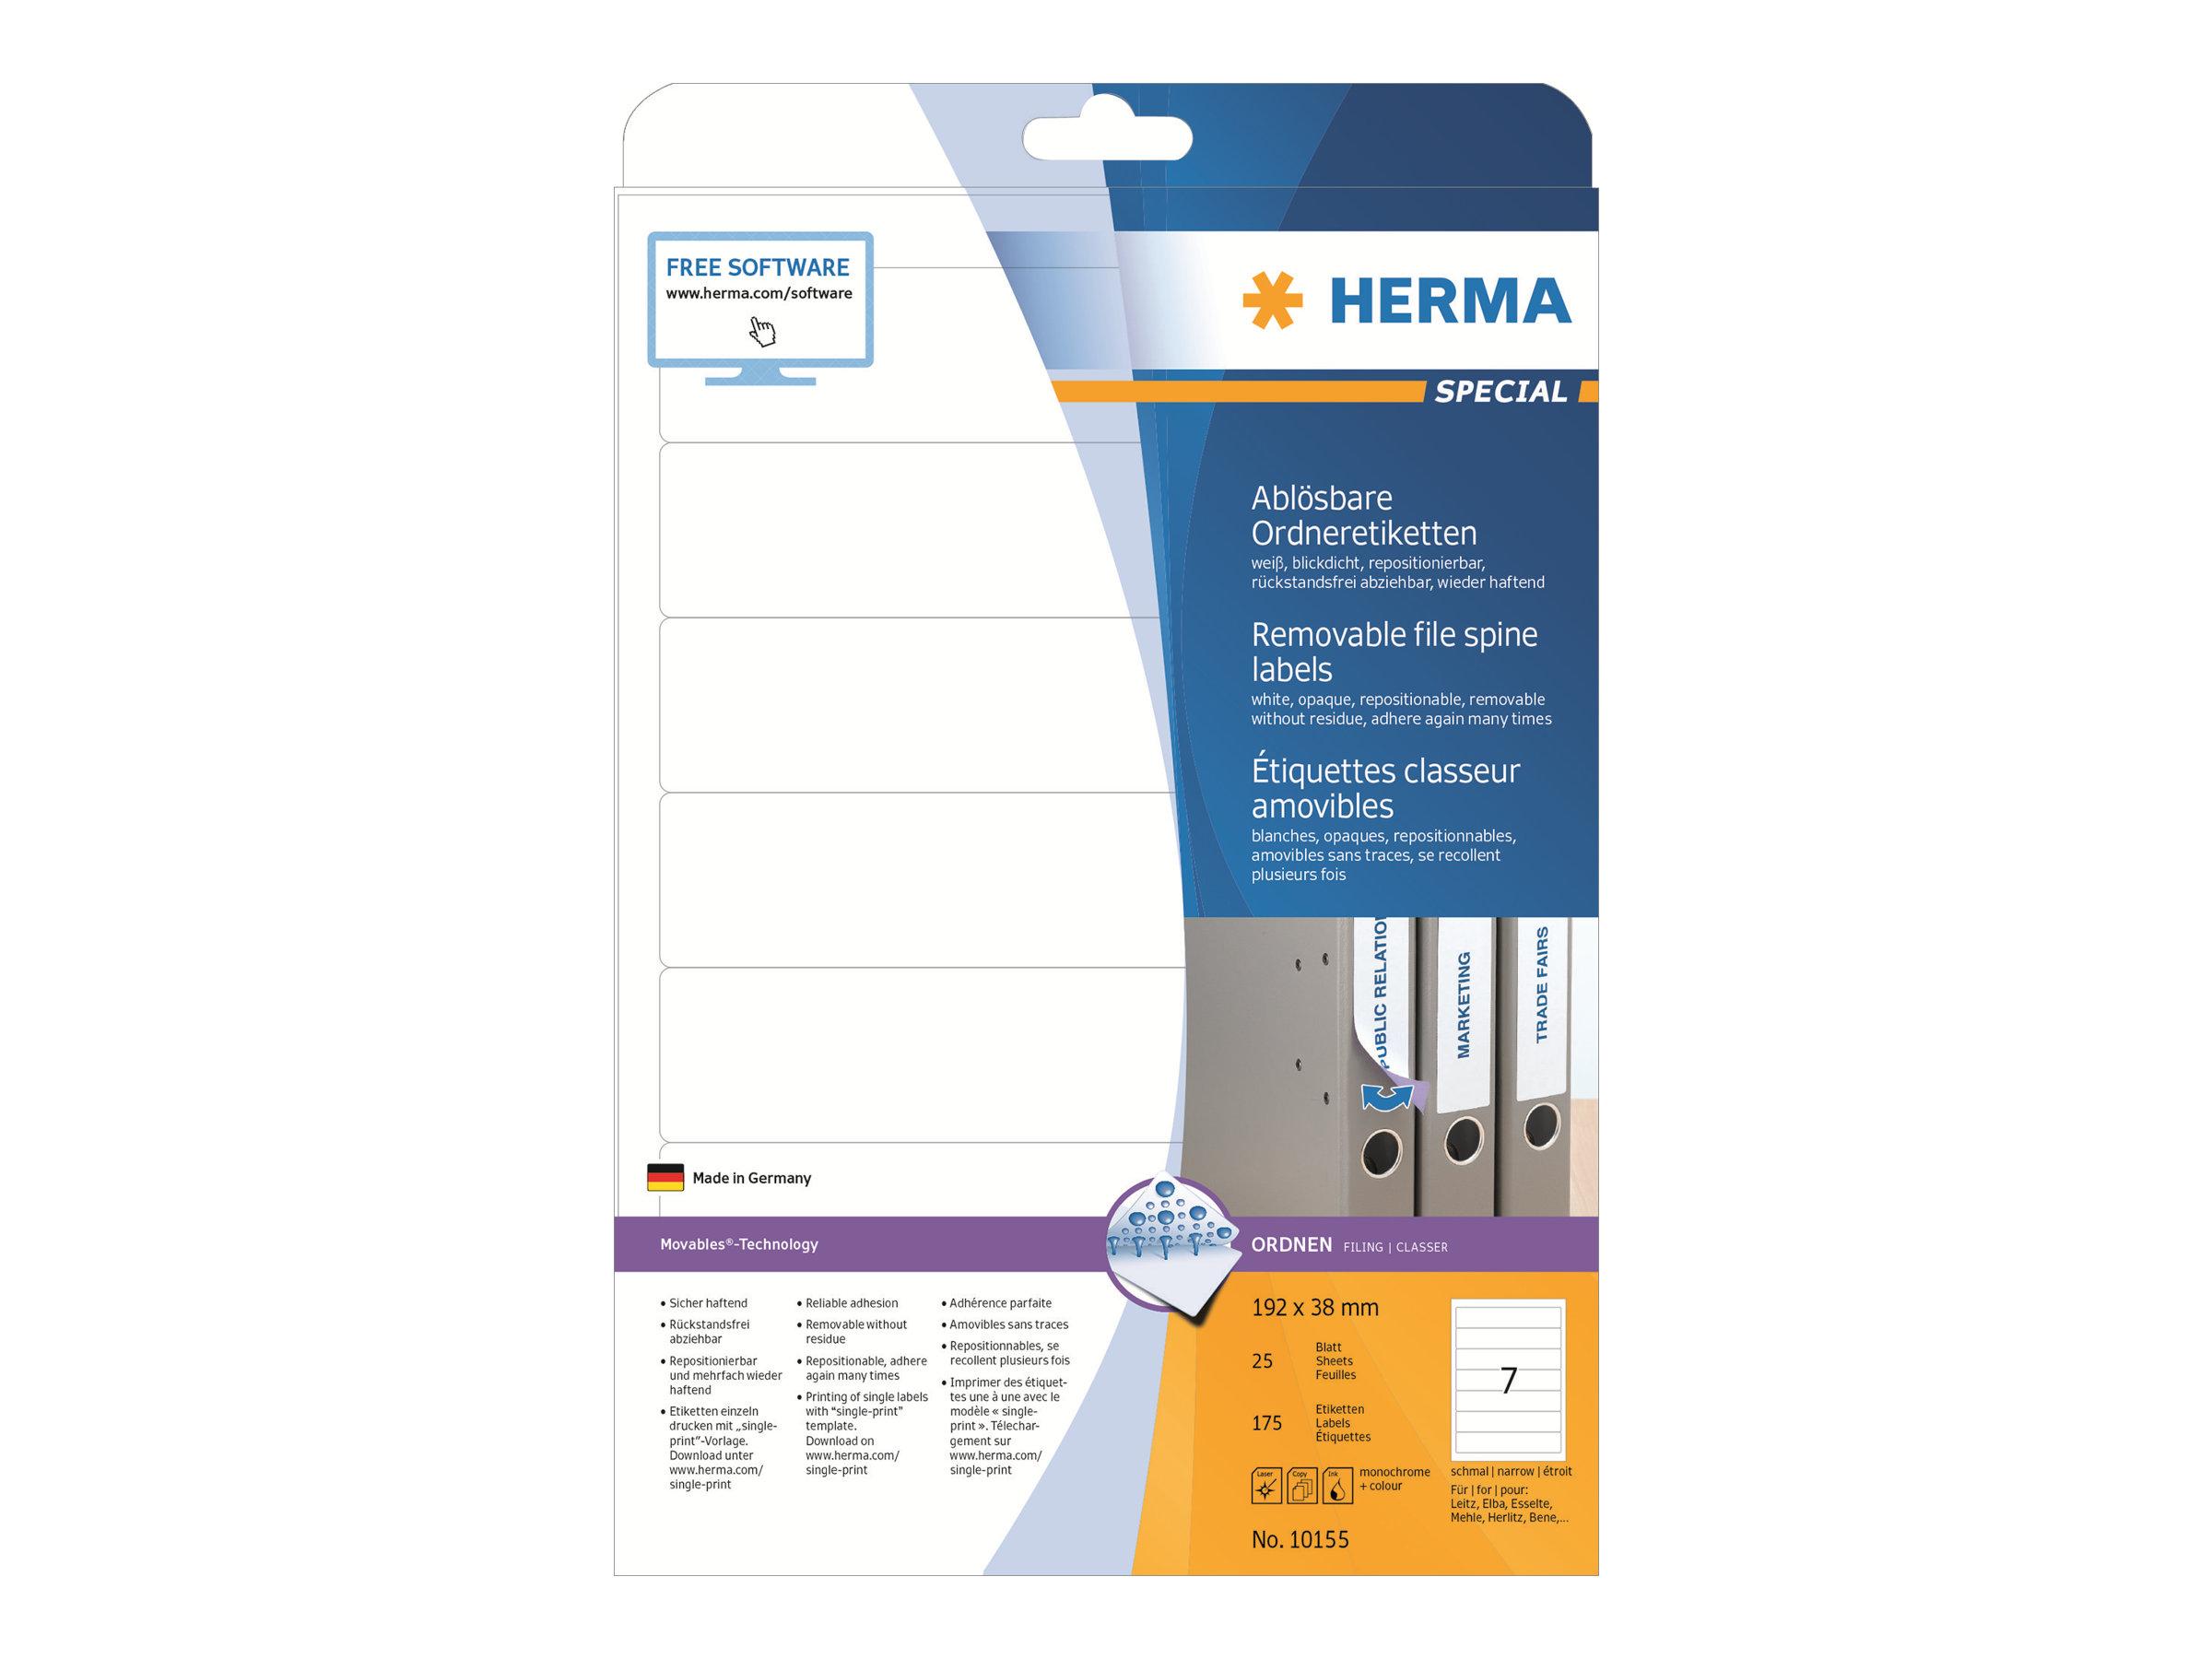 HERMA Special - Papier - matt - selbstklebend, entfernbarer Klebstoff - weiß - 192 x 38 mm 175 Etikett(en) (25 Bogen x 7)